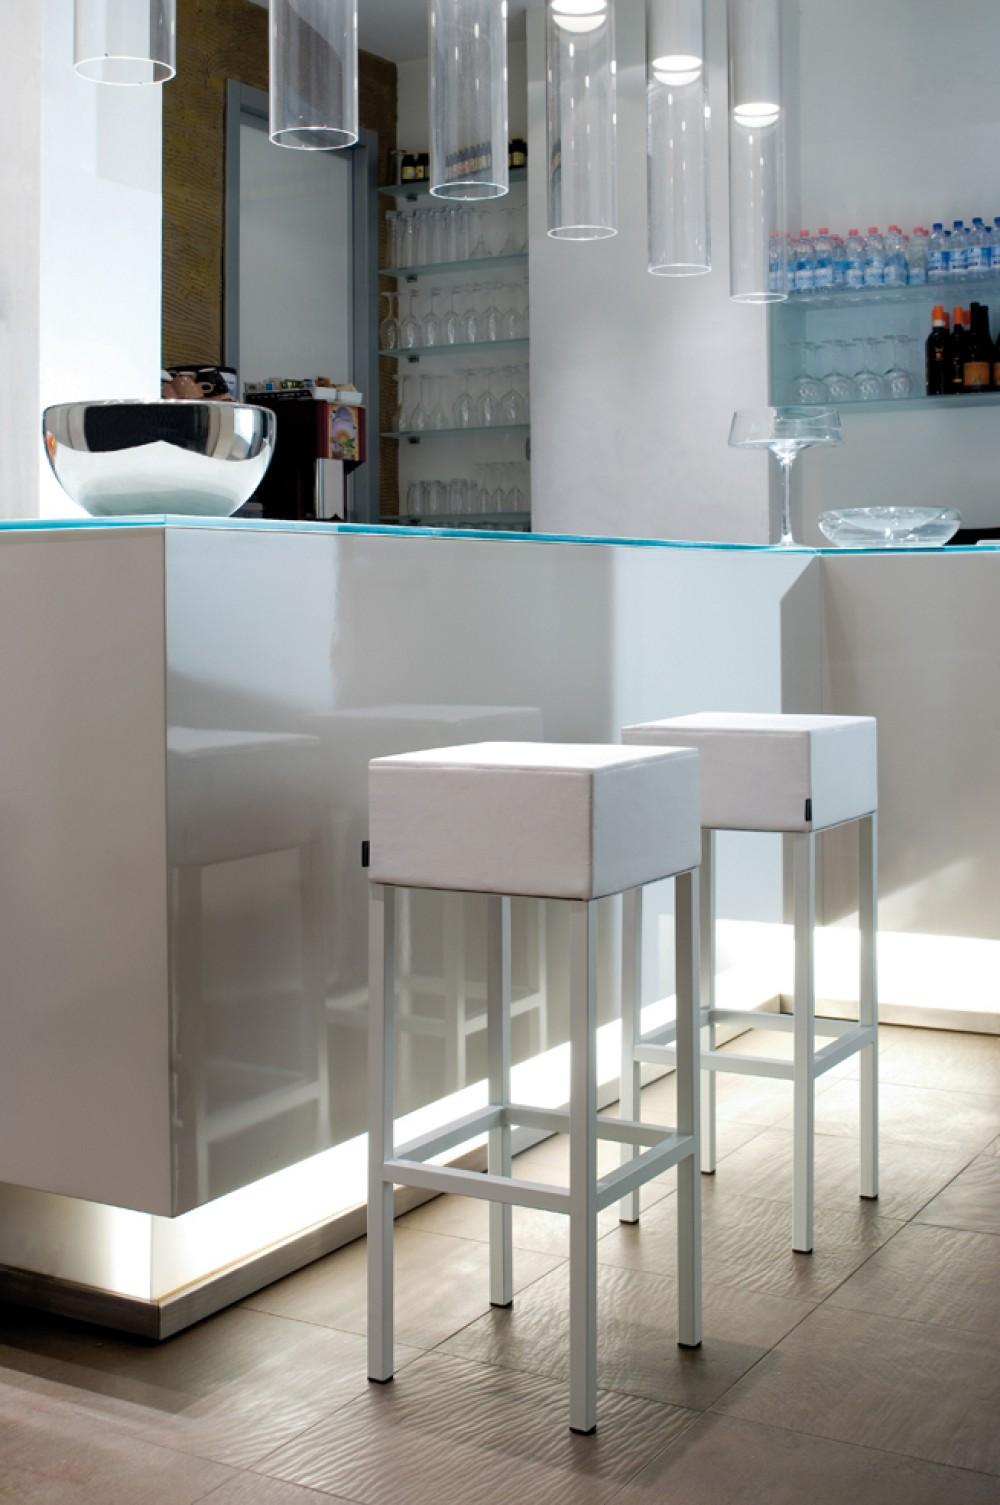 design barhocker in vier farben tresenhocker gepolstert sitzh he 65 cm. Black Bedroom Furniture Sets. Home Design Ideas